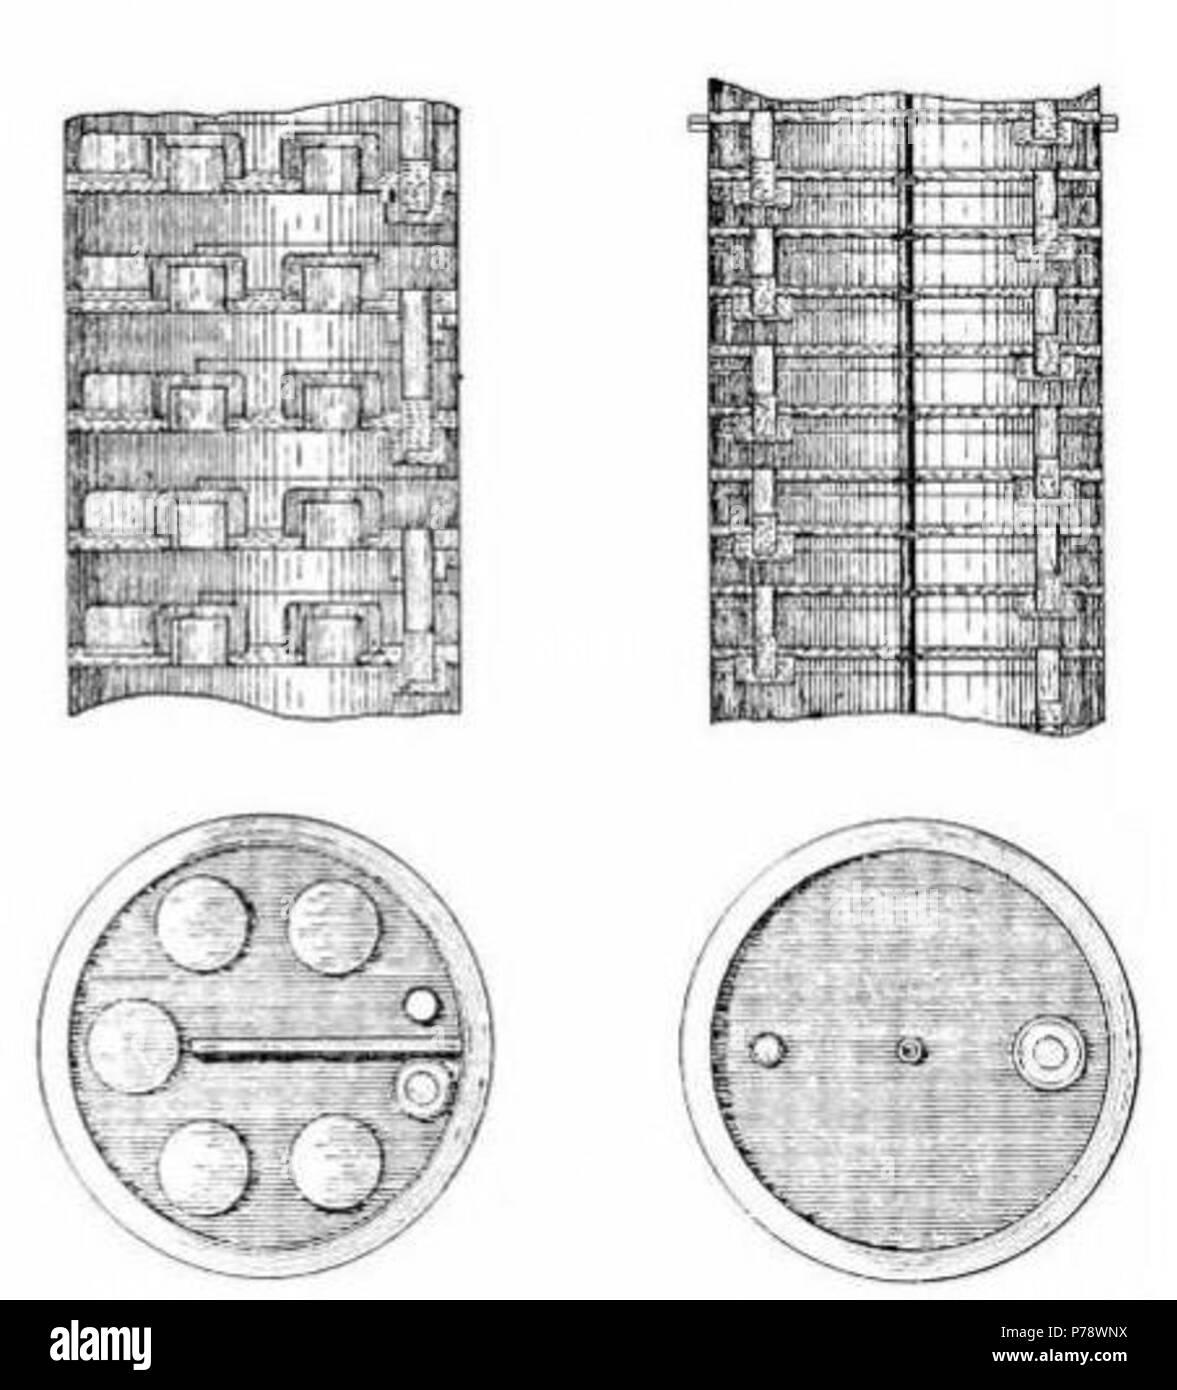 english distillation column trays bubble cap tray left and sieve tray right 1906 17 distillation column trays P78WNX english distillation column trays bubble cap tray (left) and sieve